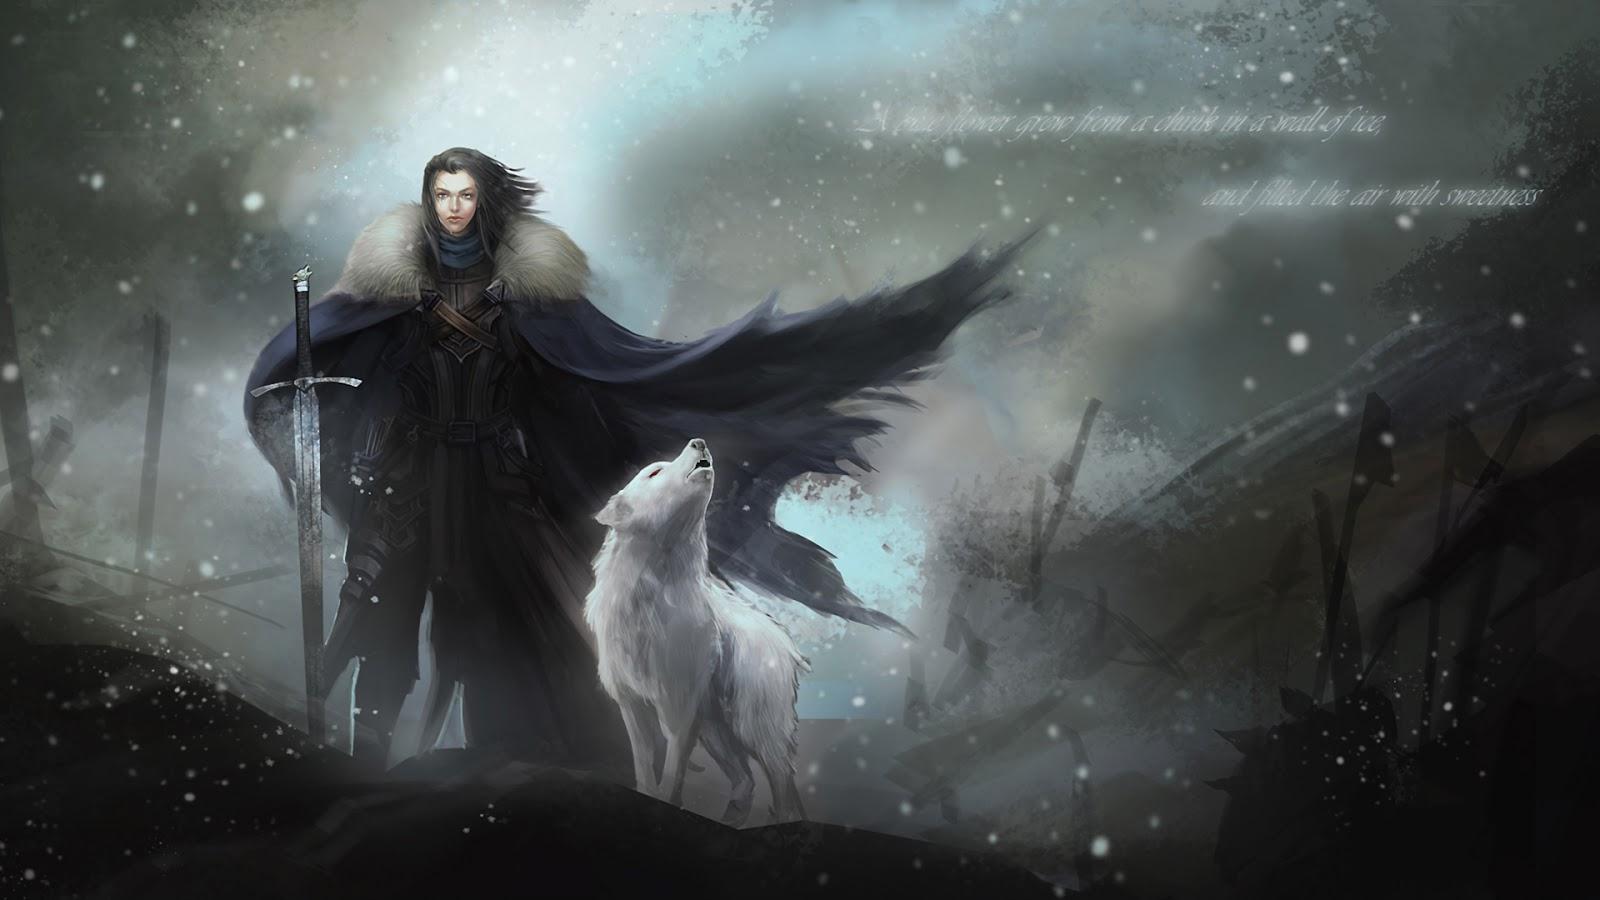 Game Of Thrones Wallpaper 1600x900